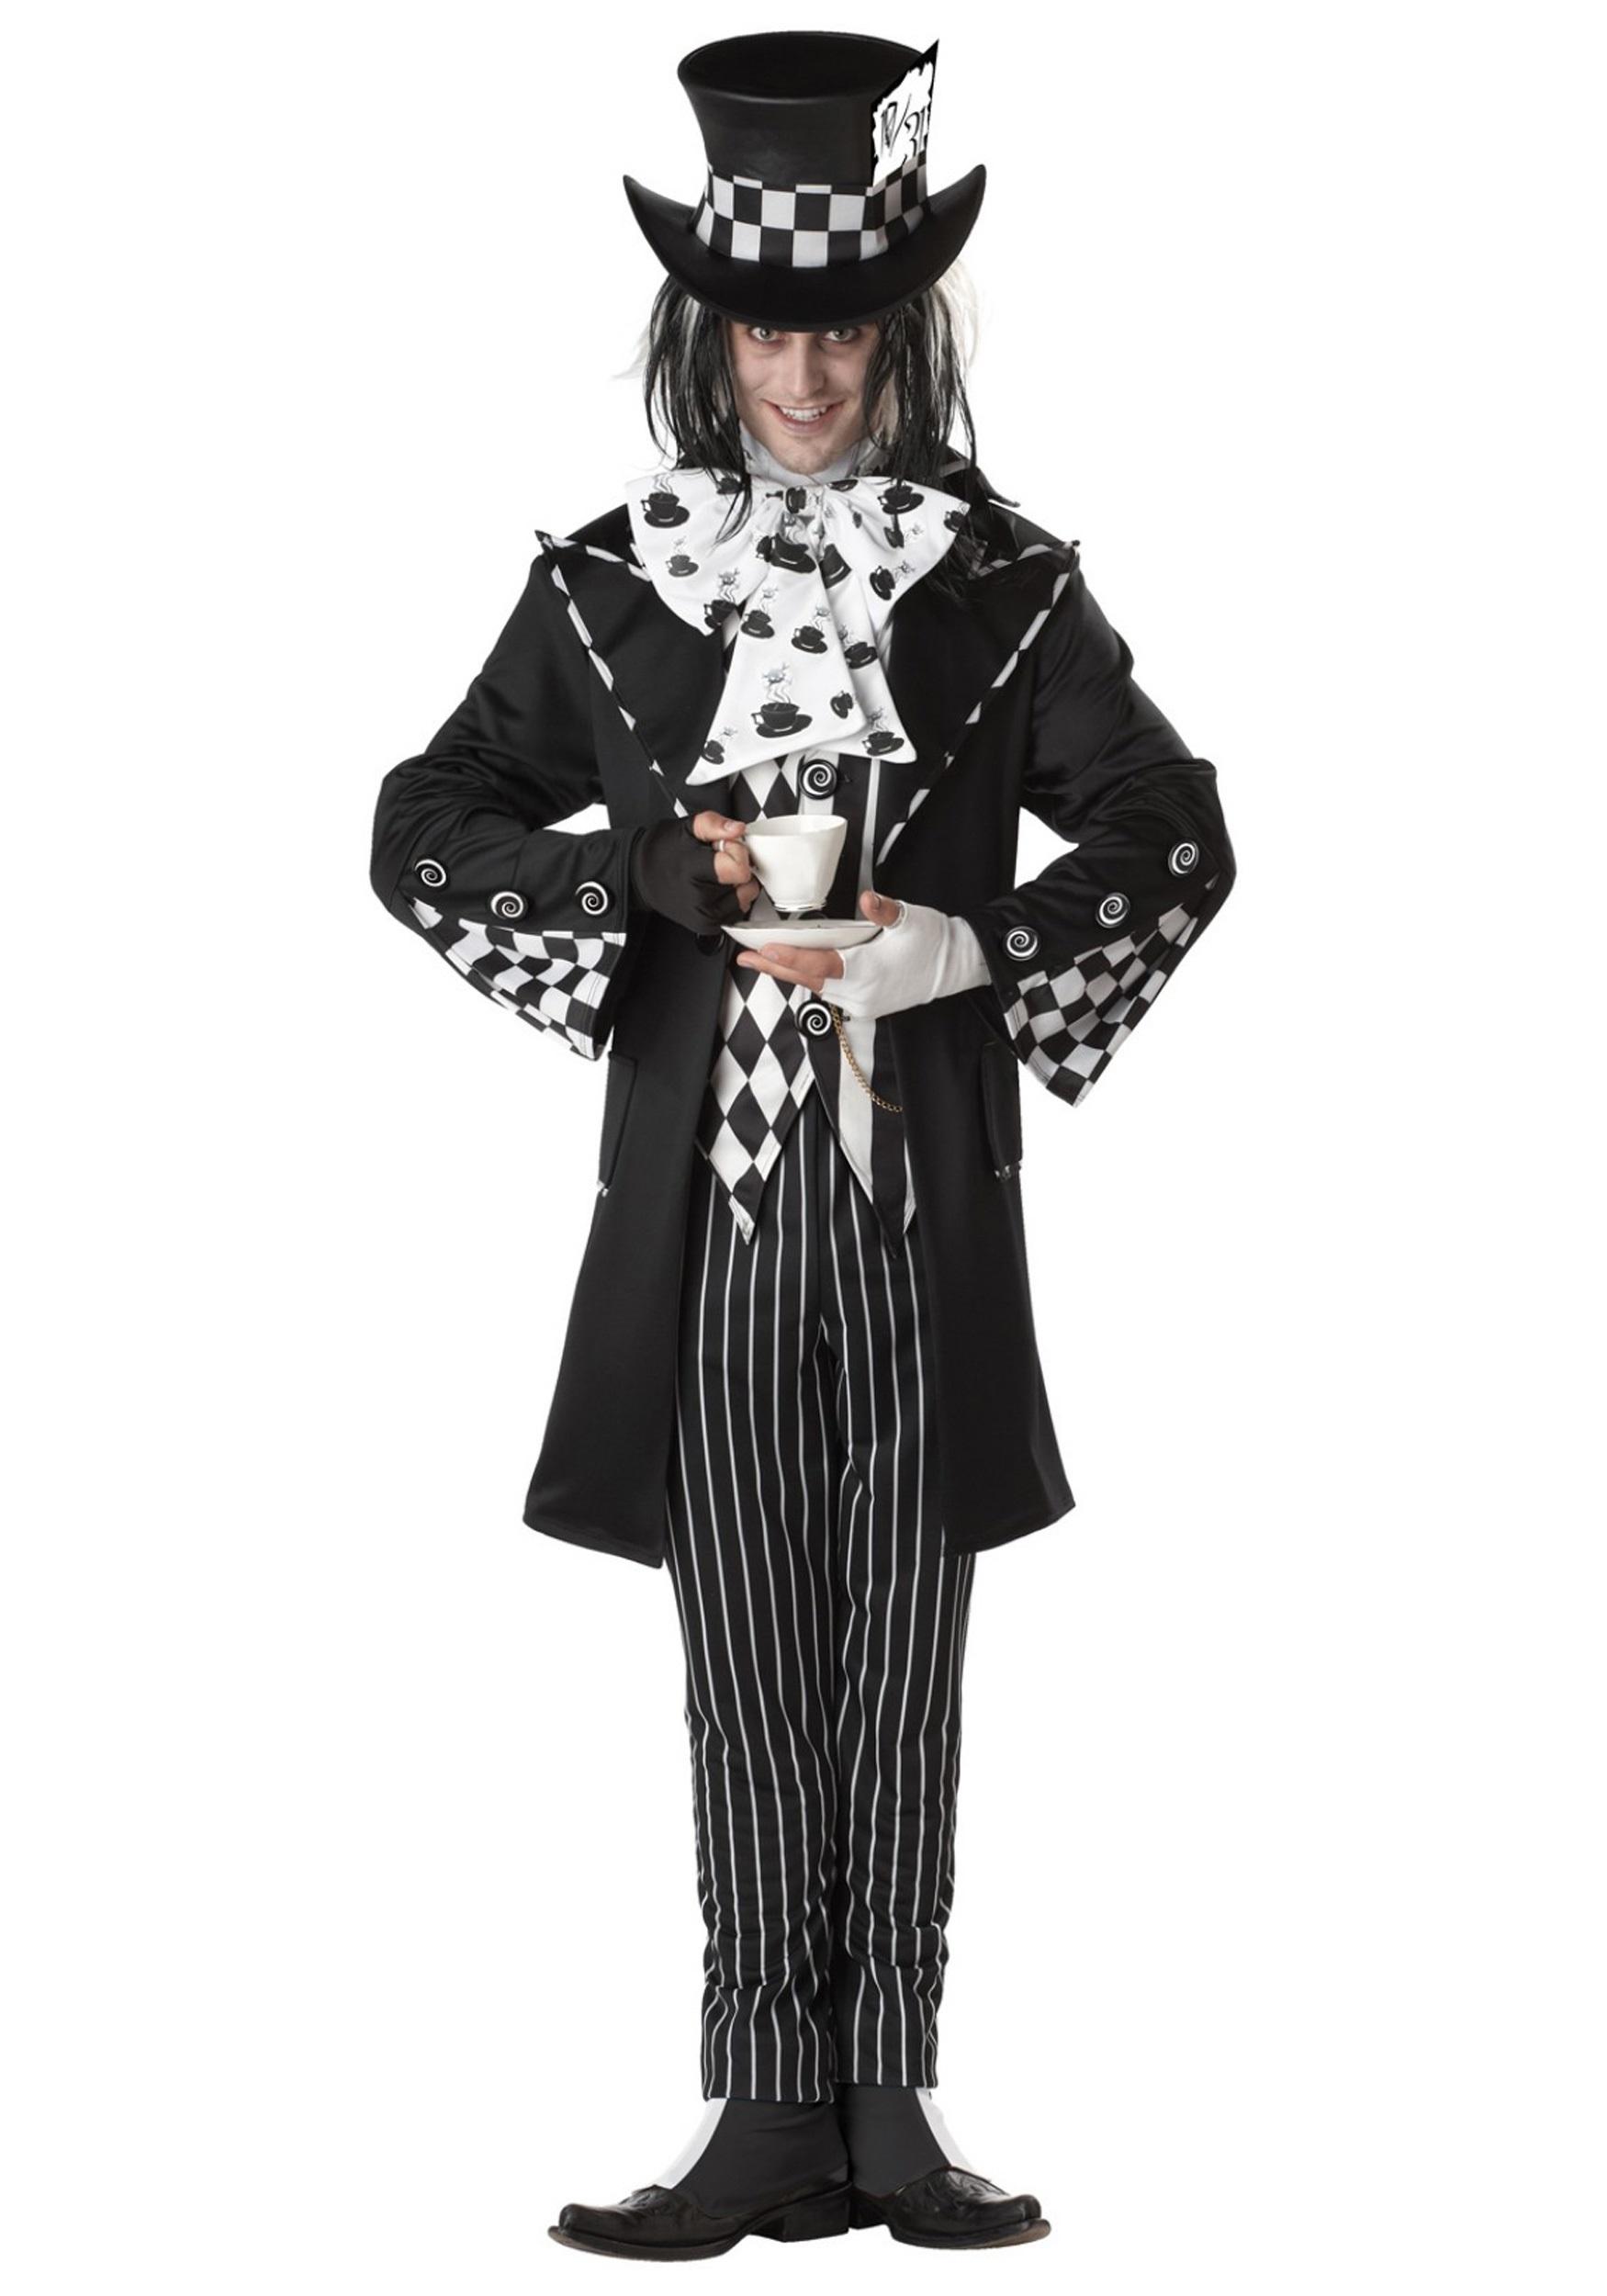 Dark Mad Hatter Costume  sc 1 st  Halloween Costumes UK & Storybook u0026 Fairytale Costumes - Adult Kids Fairy Tale Character ...